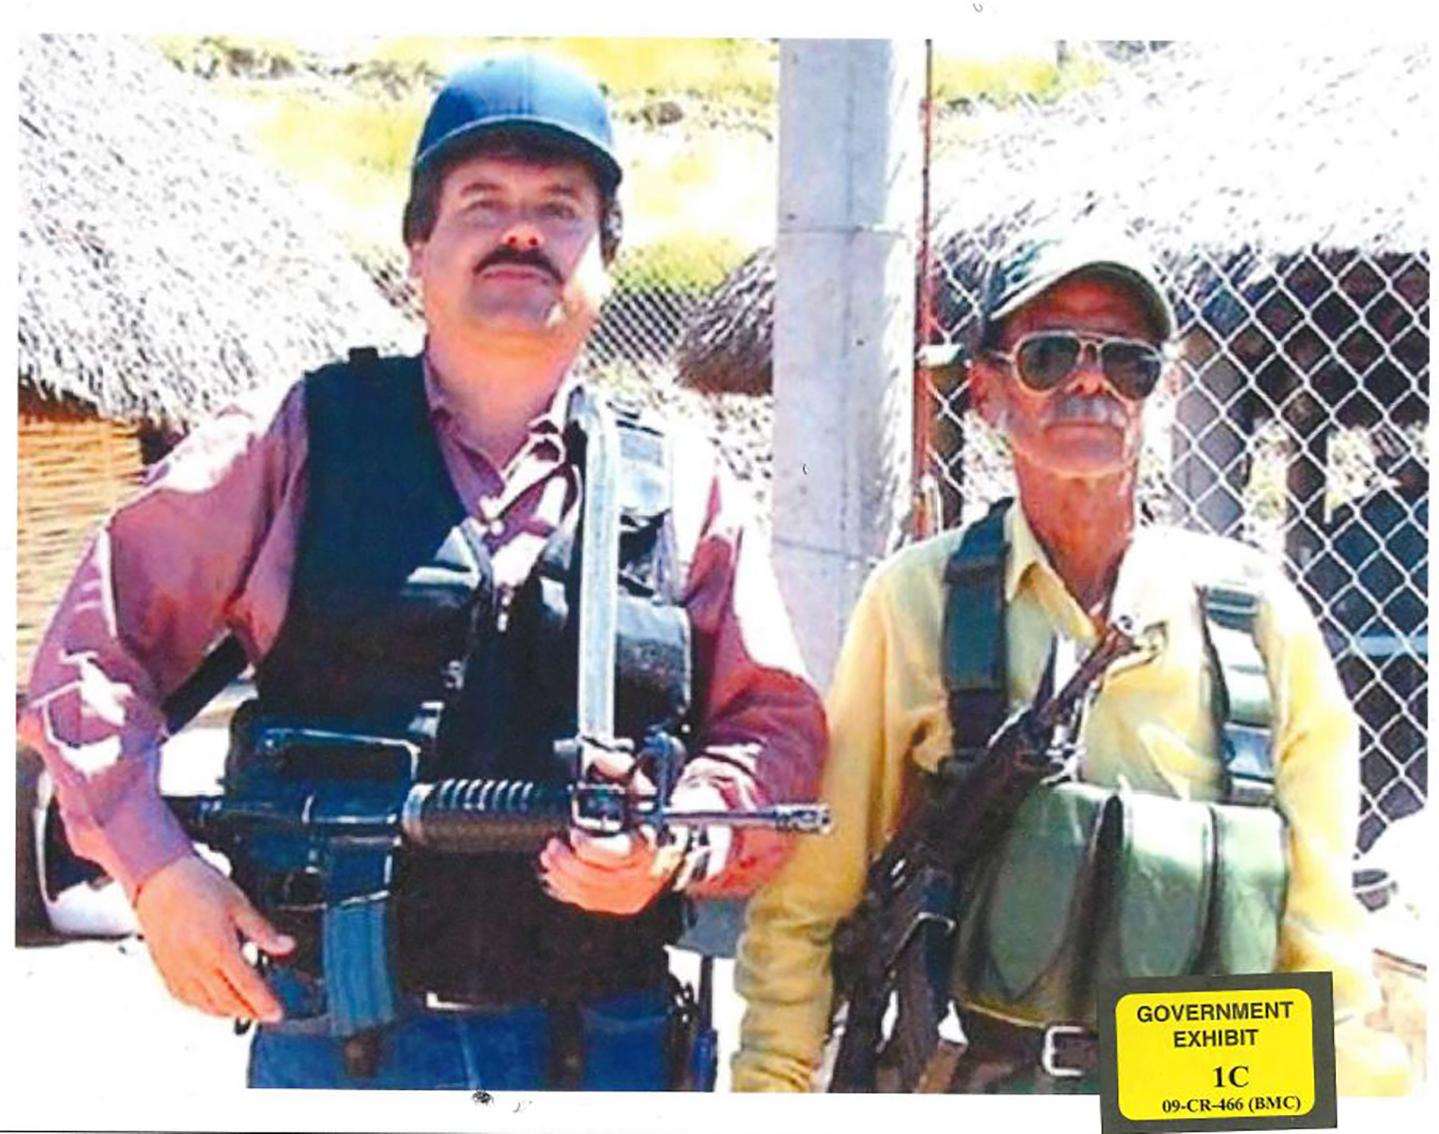 Esküdtszék: El Chapo bűnös